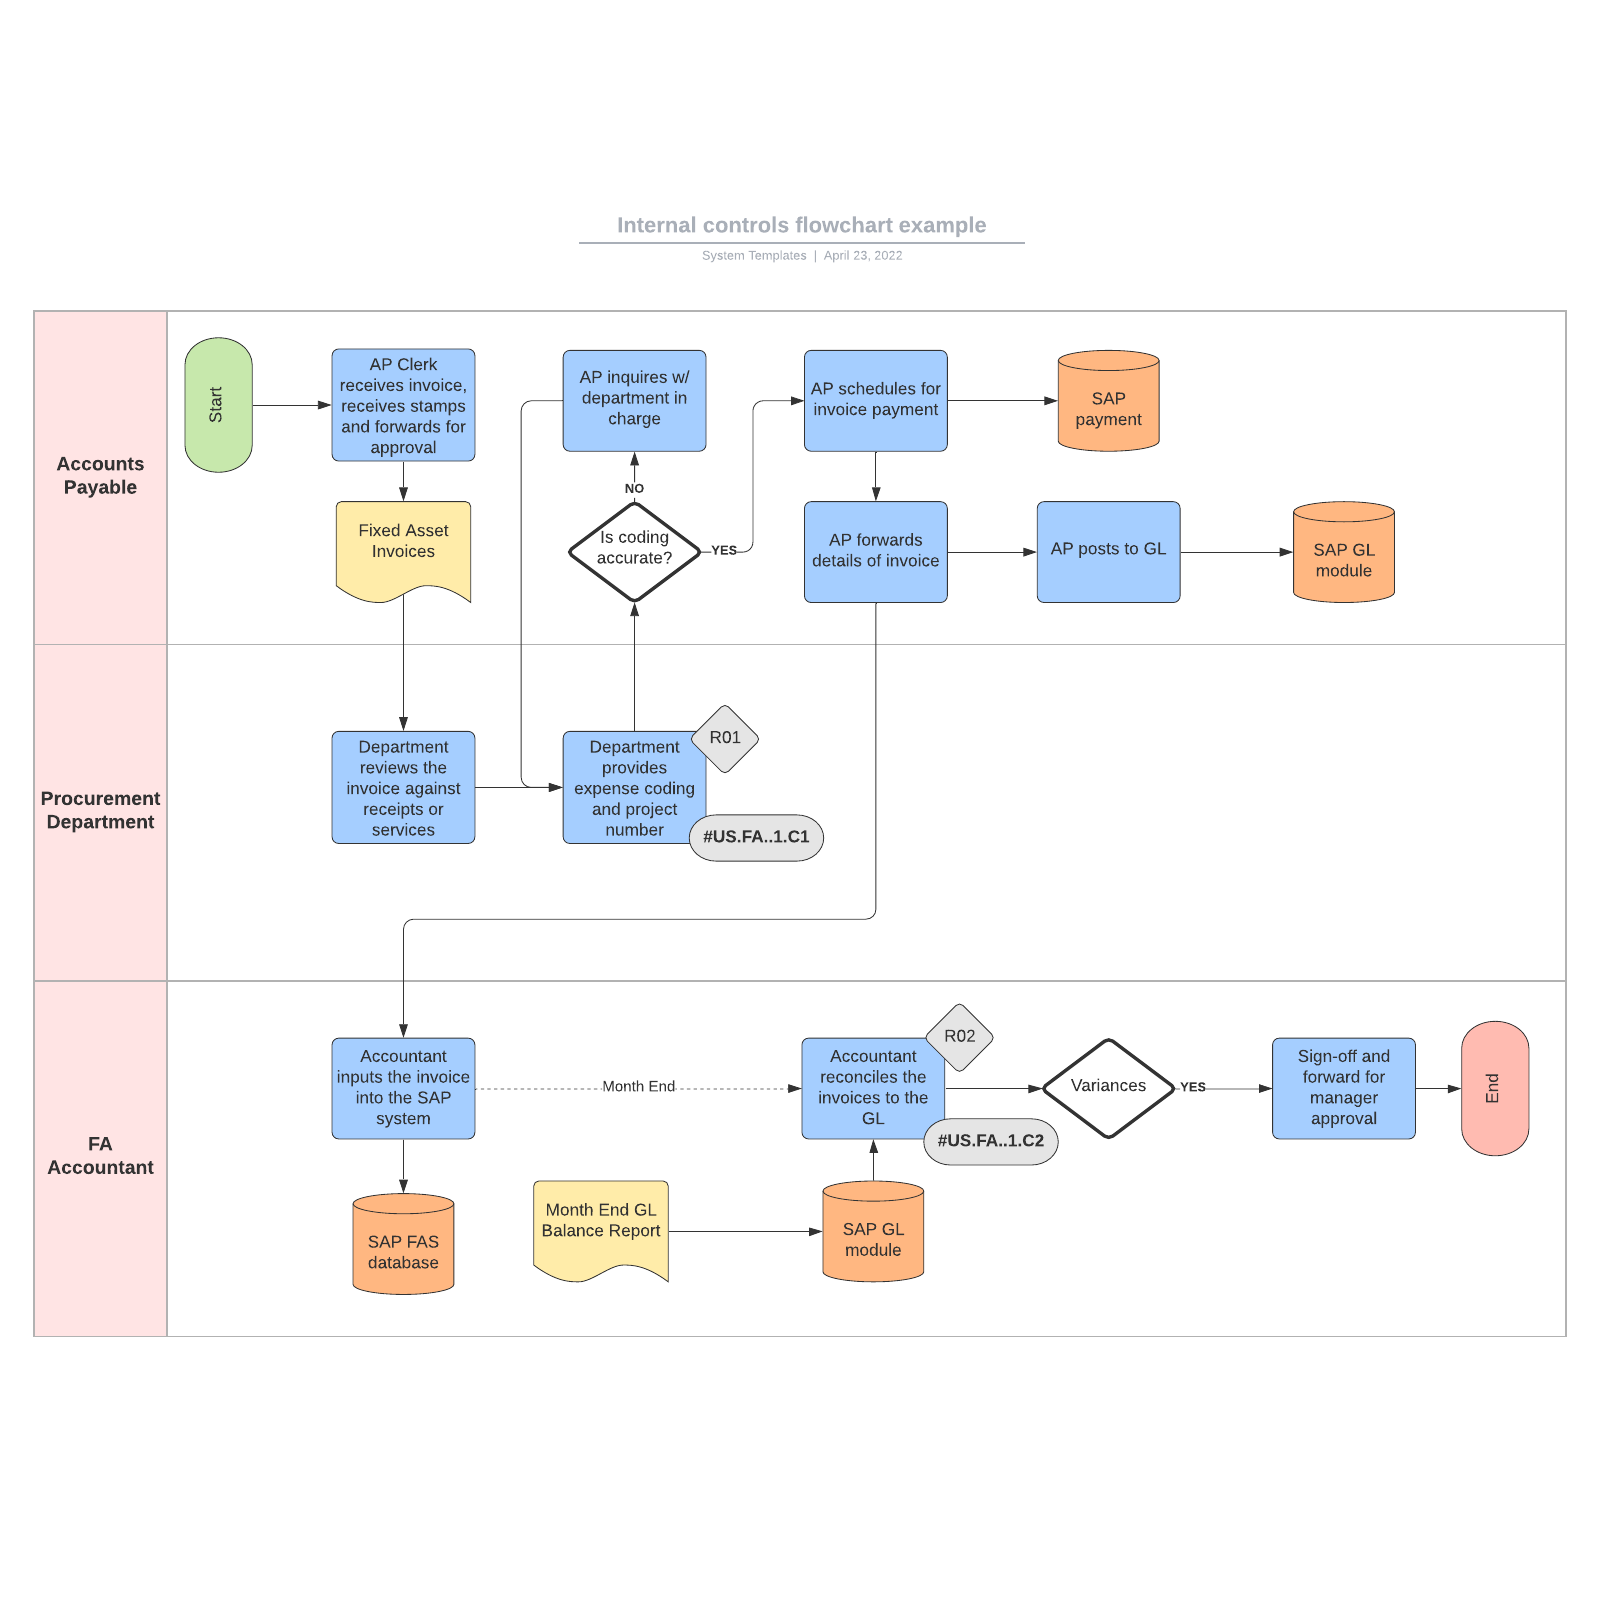 Internal controls flowchart example